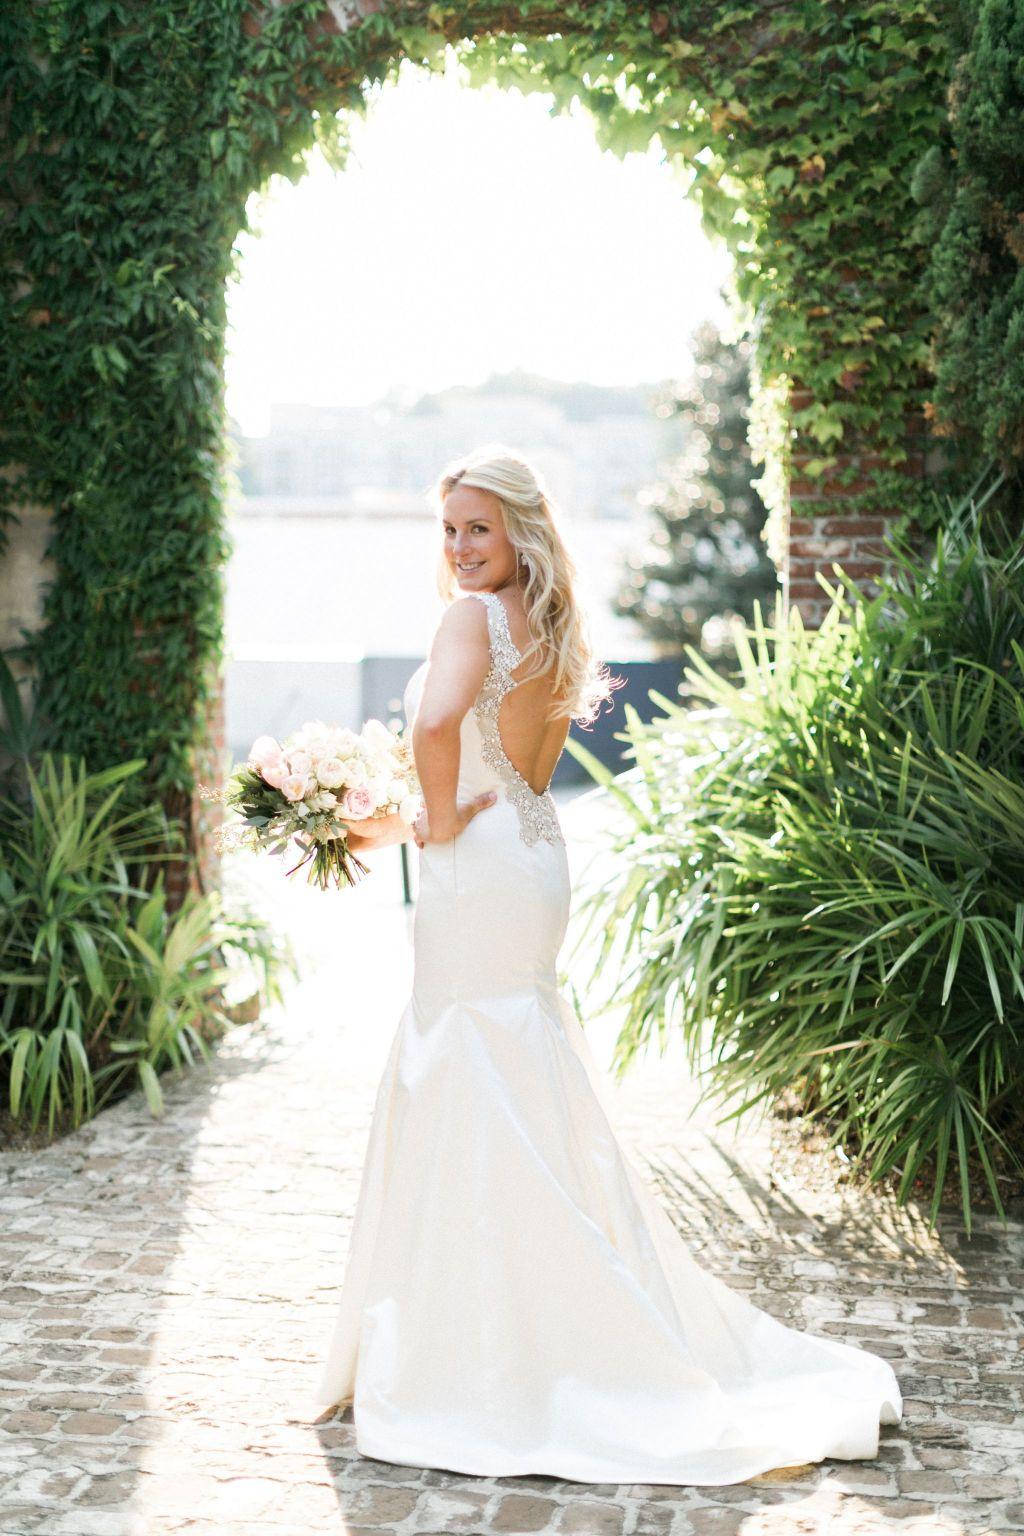 Hayley Paige 54640200 wedding dress